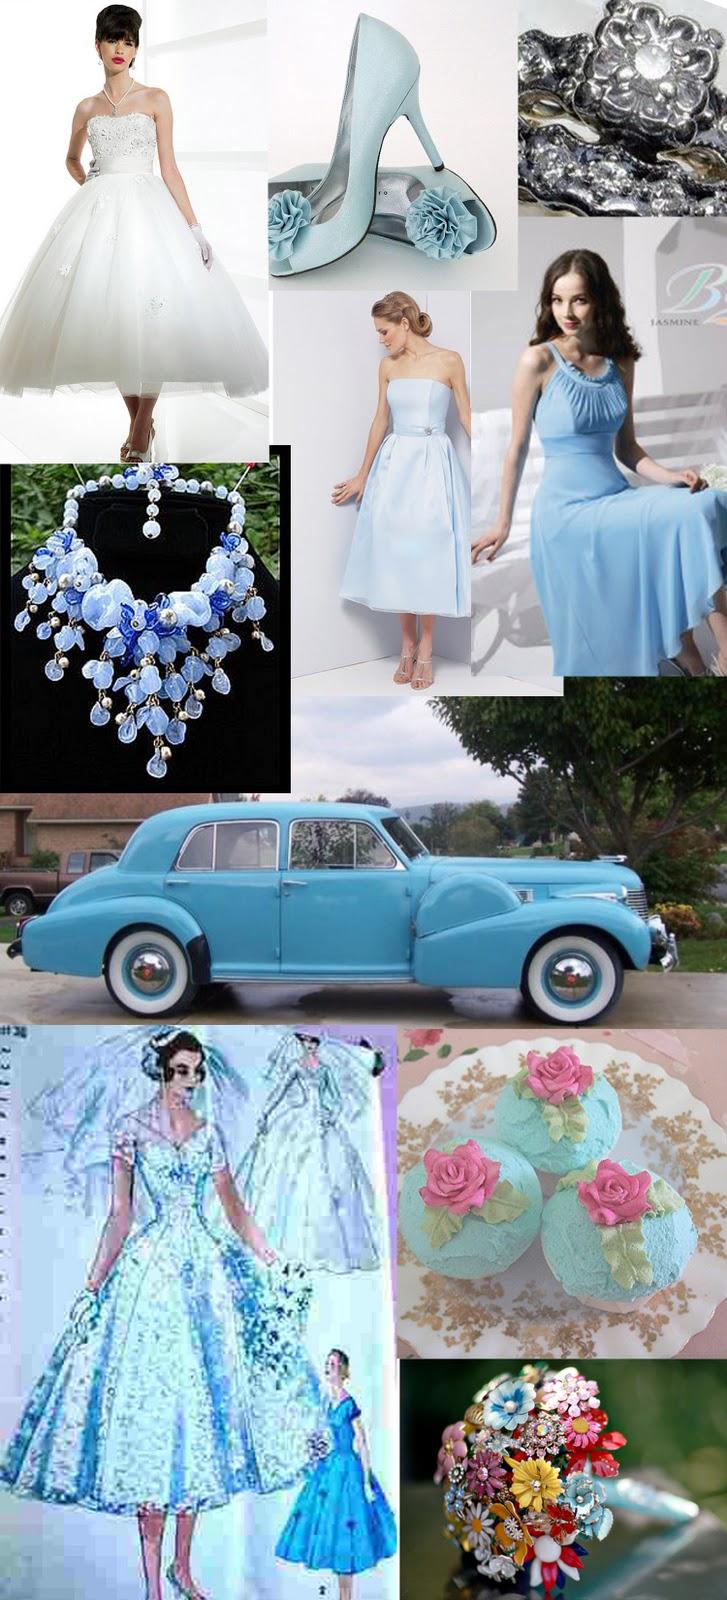 Weddingzilla Vintage Wedding Inspiration Boards Retro Wedding Ideas